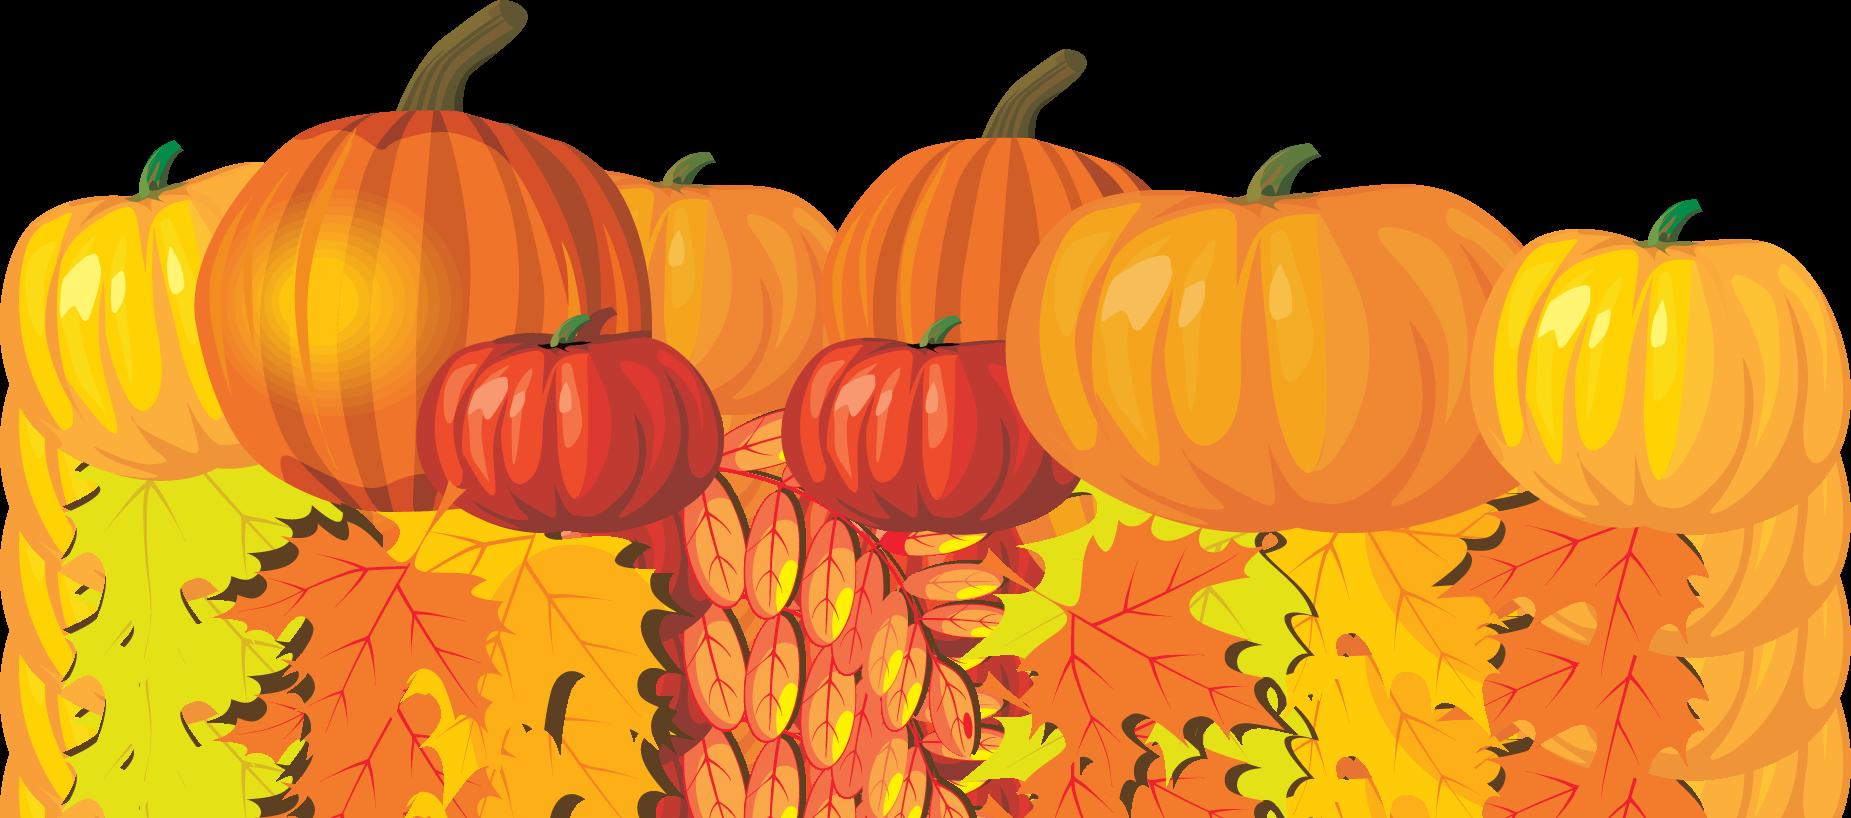 Autumn clipartix. Pumpkin clipart day